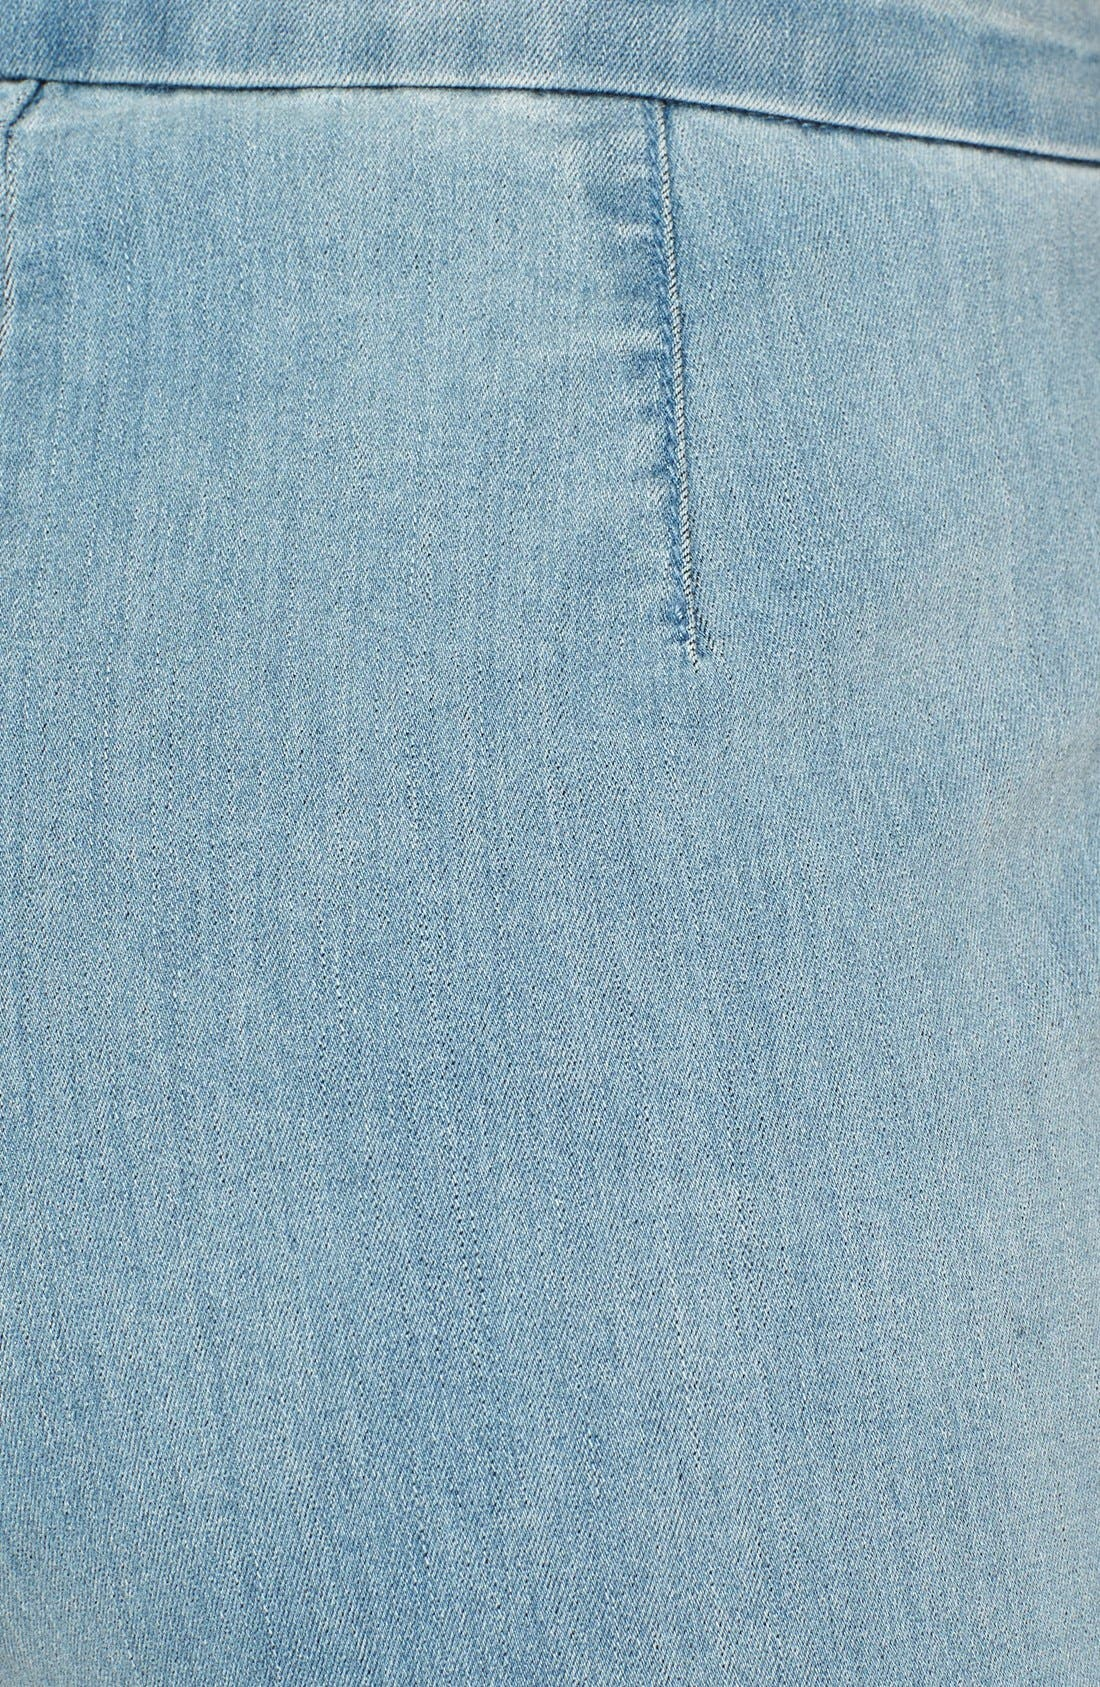 Alternate Image 3  - Free People 'Retro' High Rise Denim Shorts (Ward)